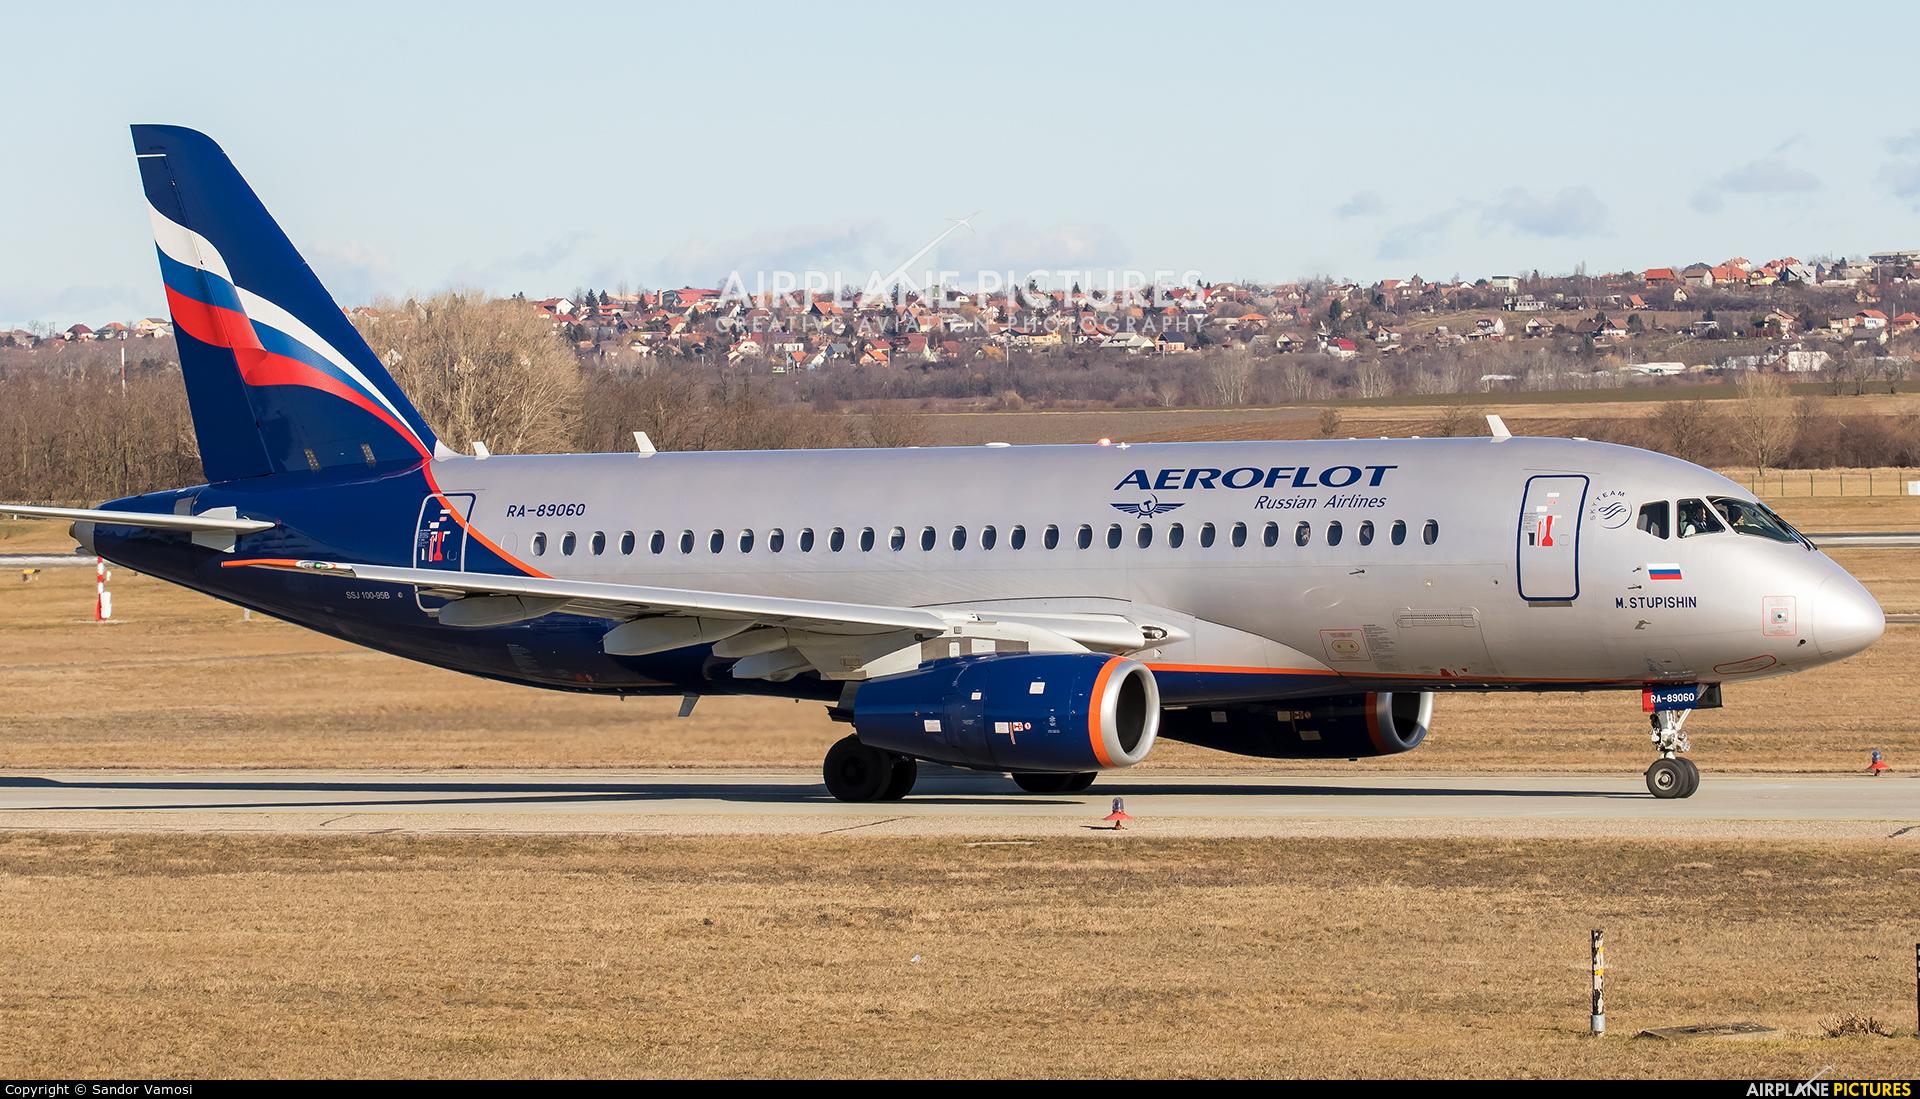 Aeroflot RA-89060 aircraft at Budapest Ferenc Liszt International Airport